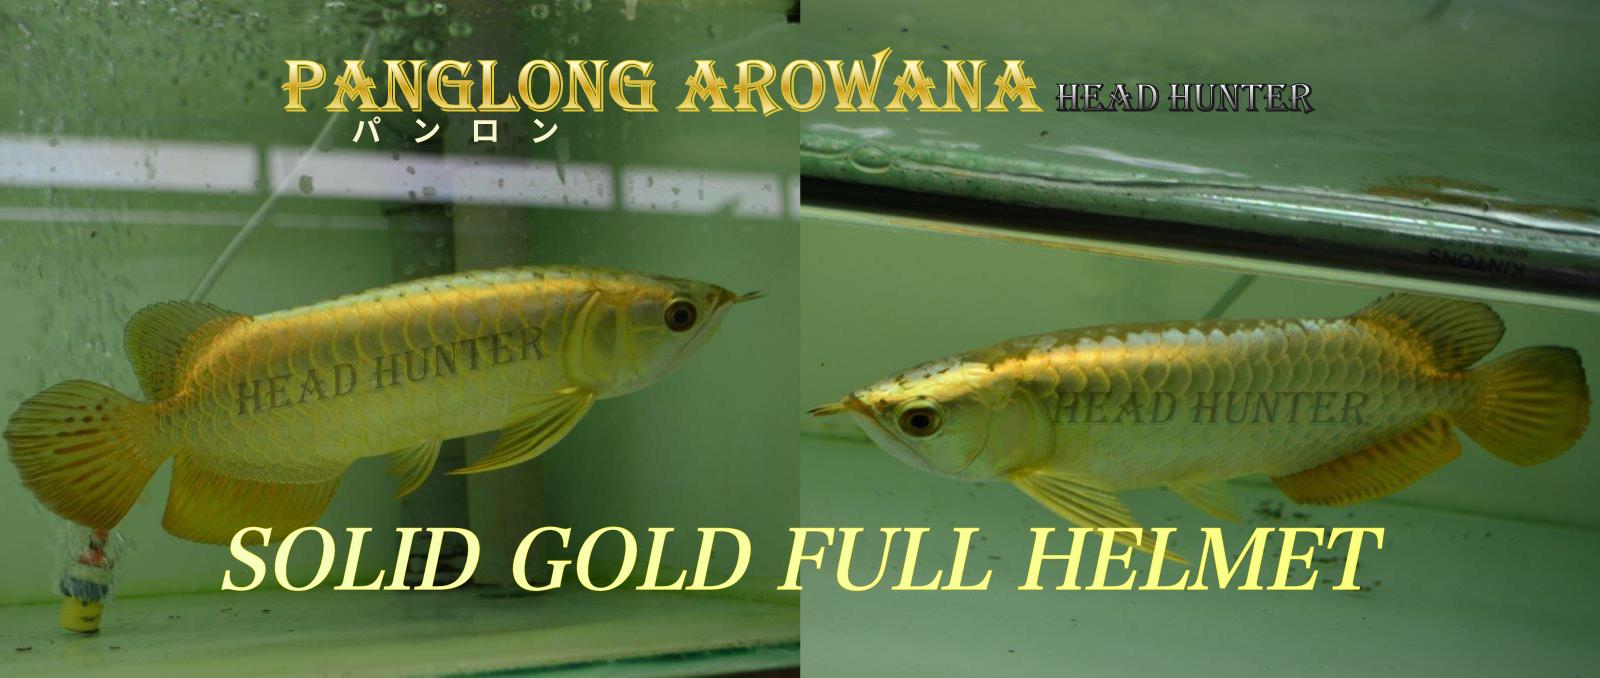 SOLID GOLD FULL HELMET